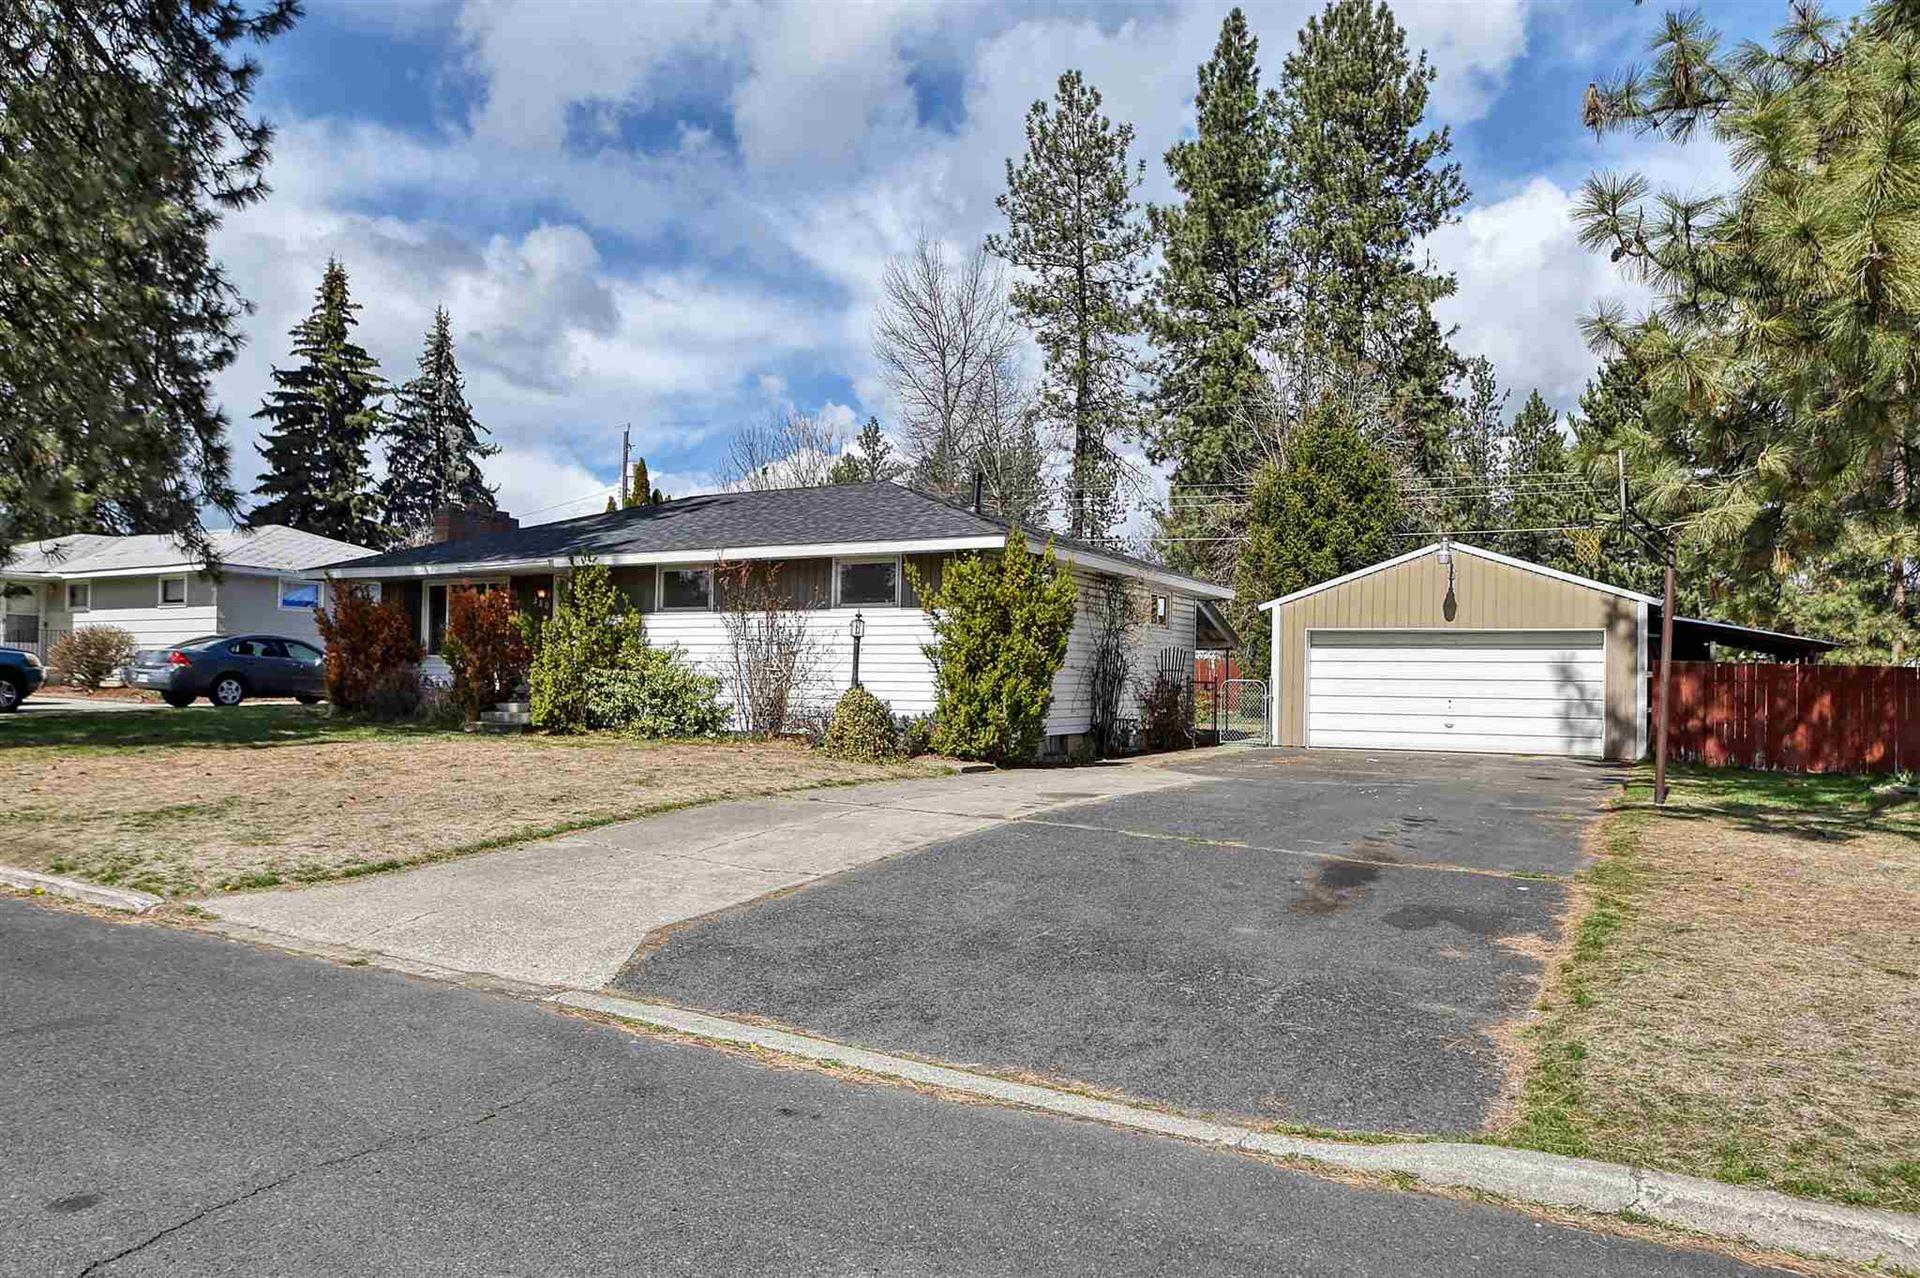 220 W Horner Ave, Spokane, WA 99218 - #: 202113800